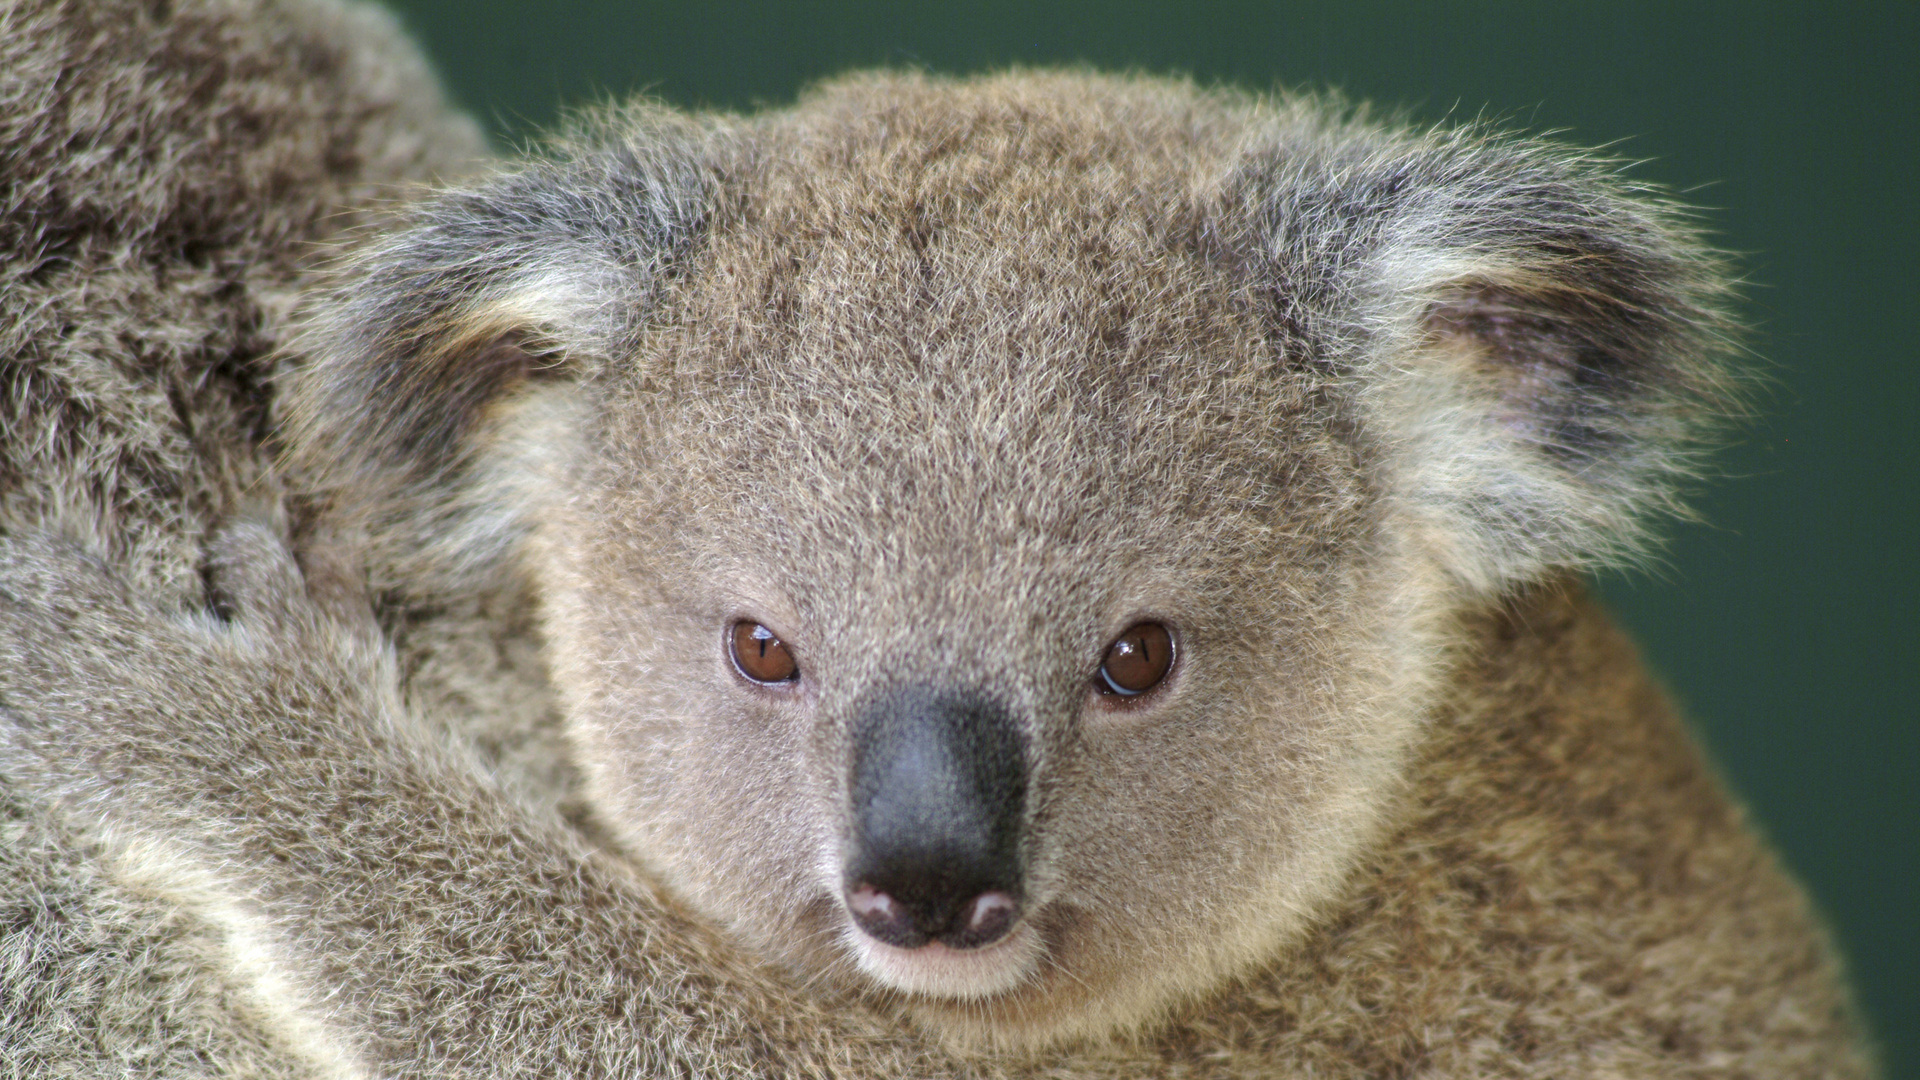 koala full hd wallpaper and background 1920x1080 id431601